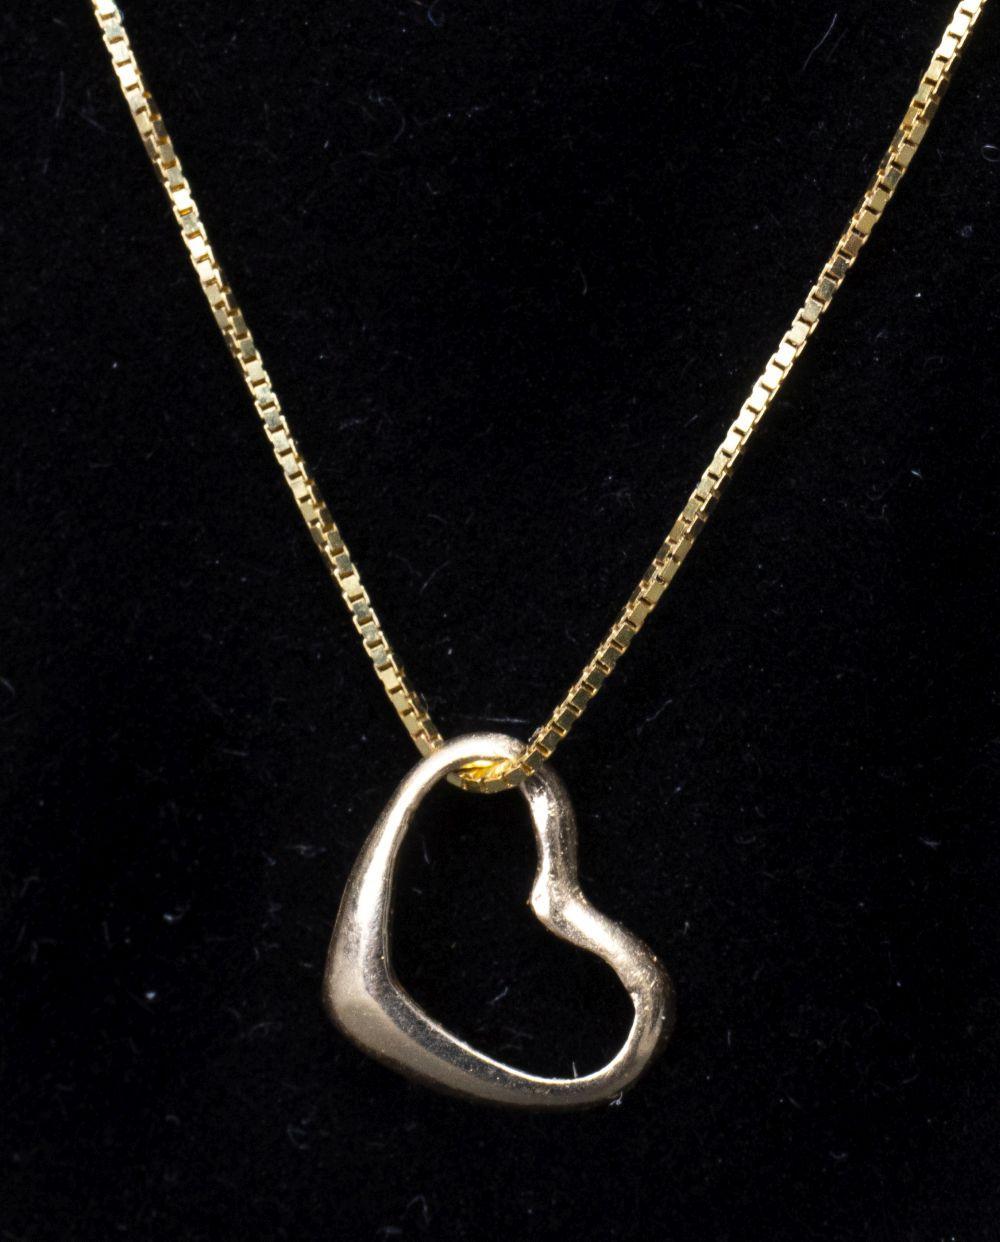 14K Yellow Gold Open Heart Pendant On 10K Chain